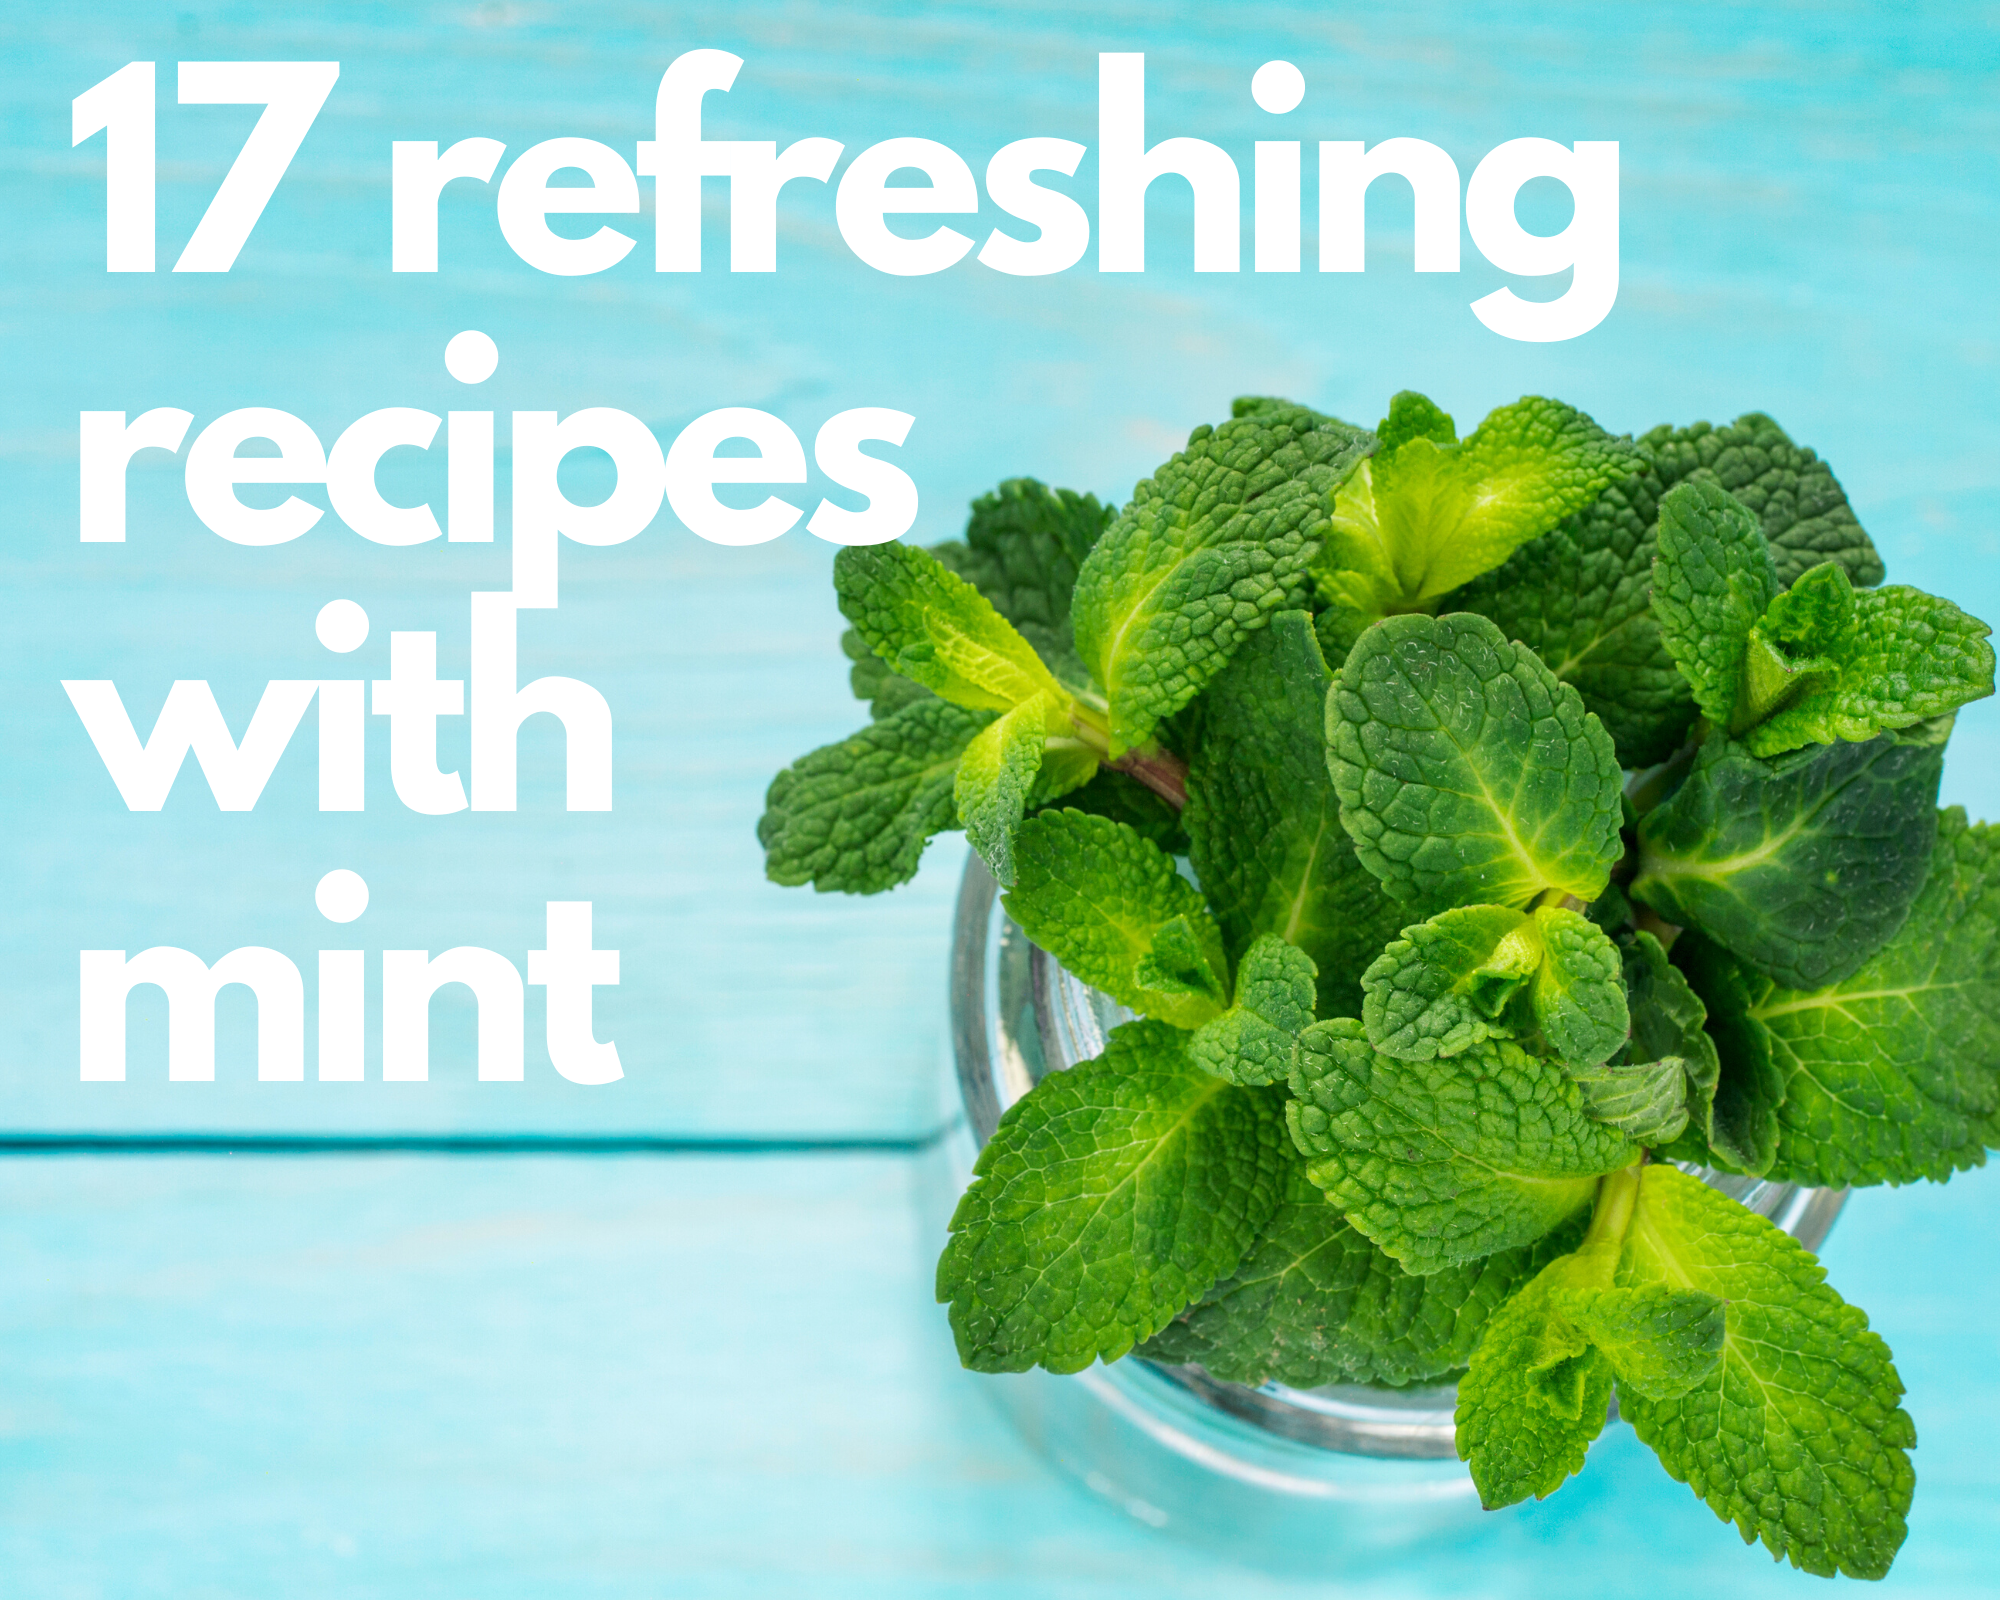 A bundle of fresh mint